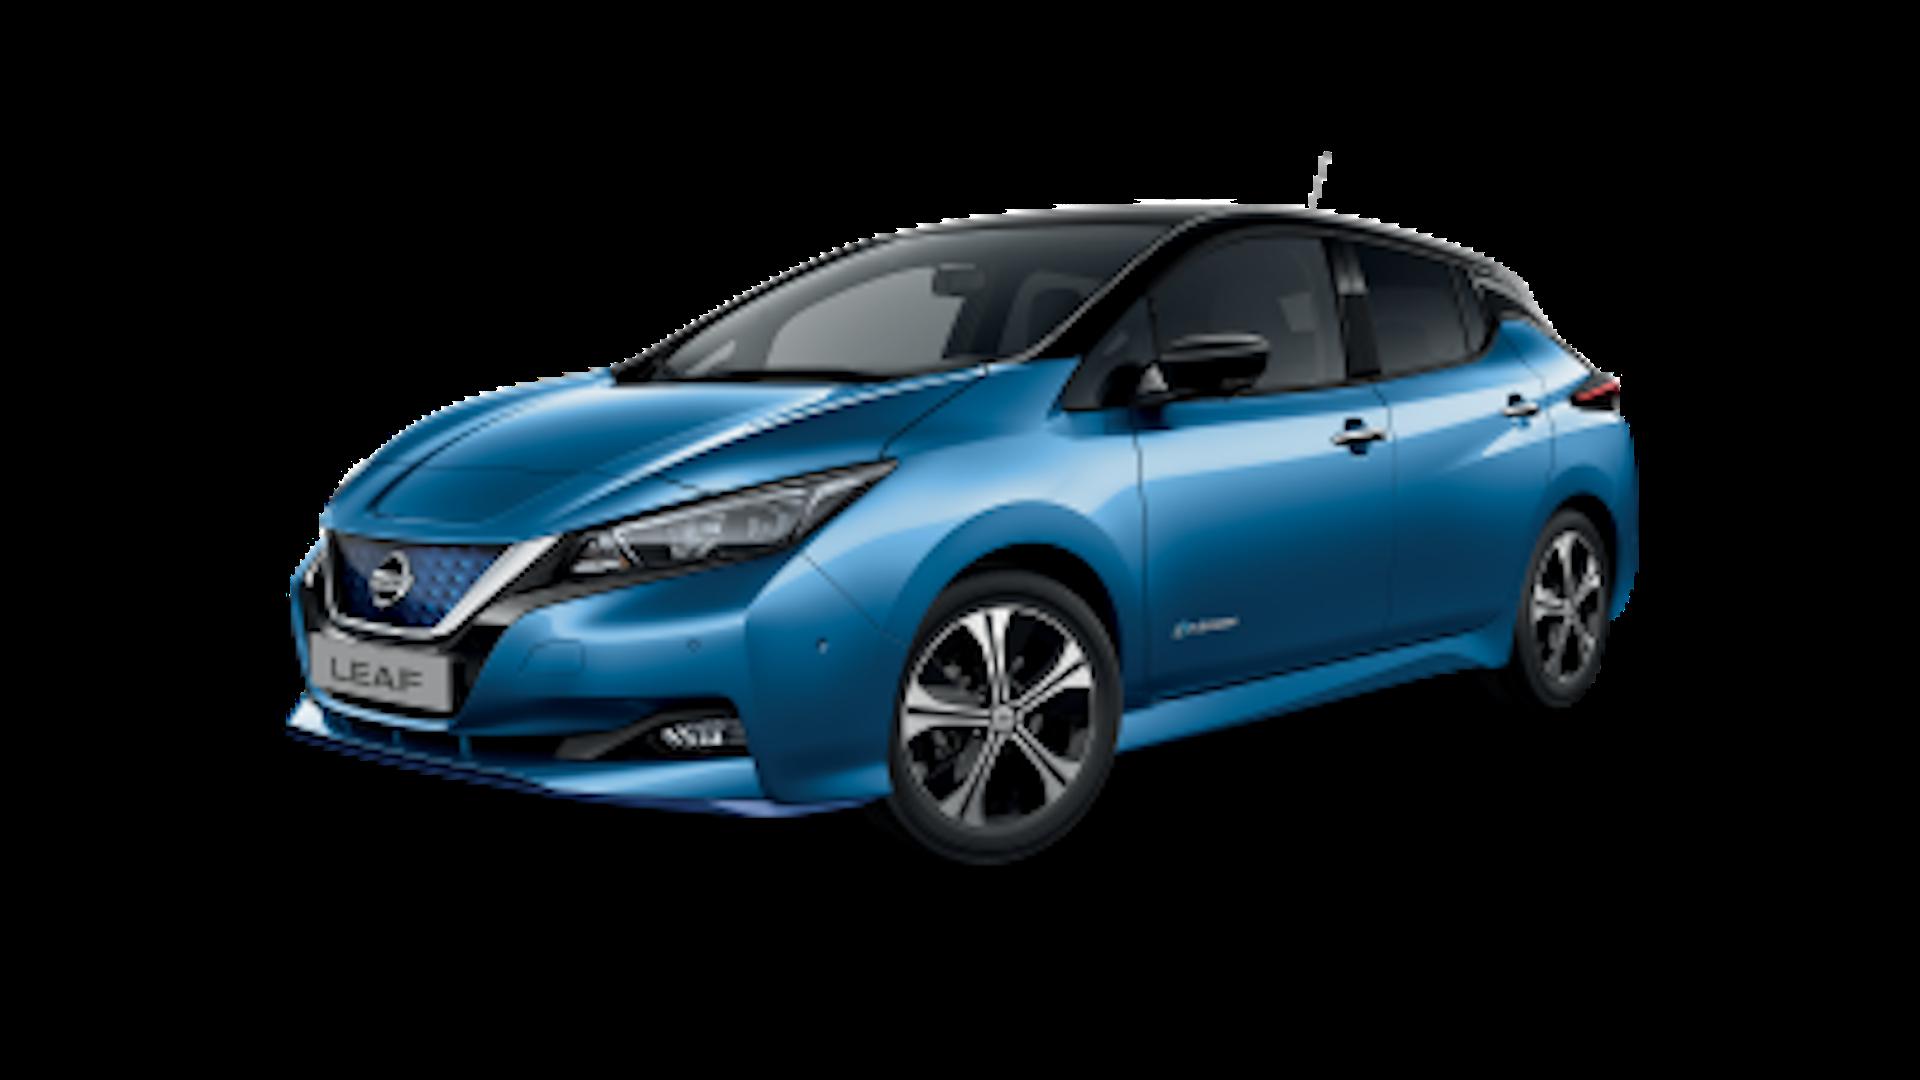 Nissan Leaf em azul